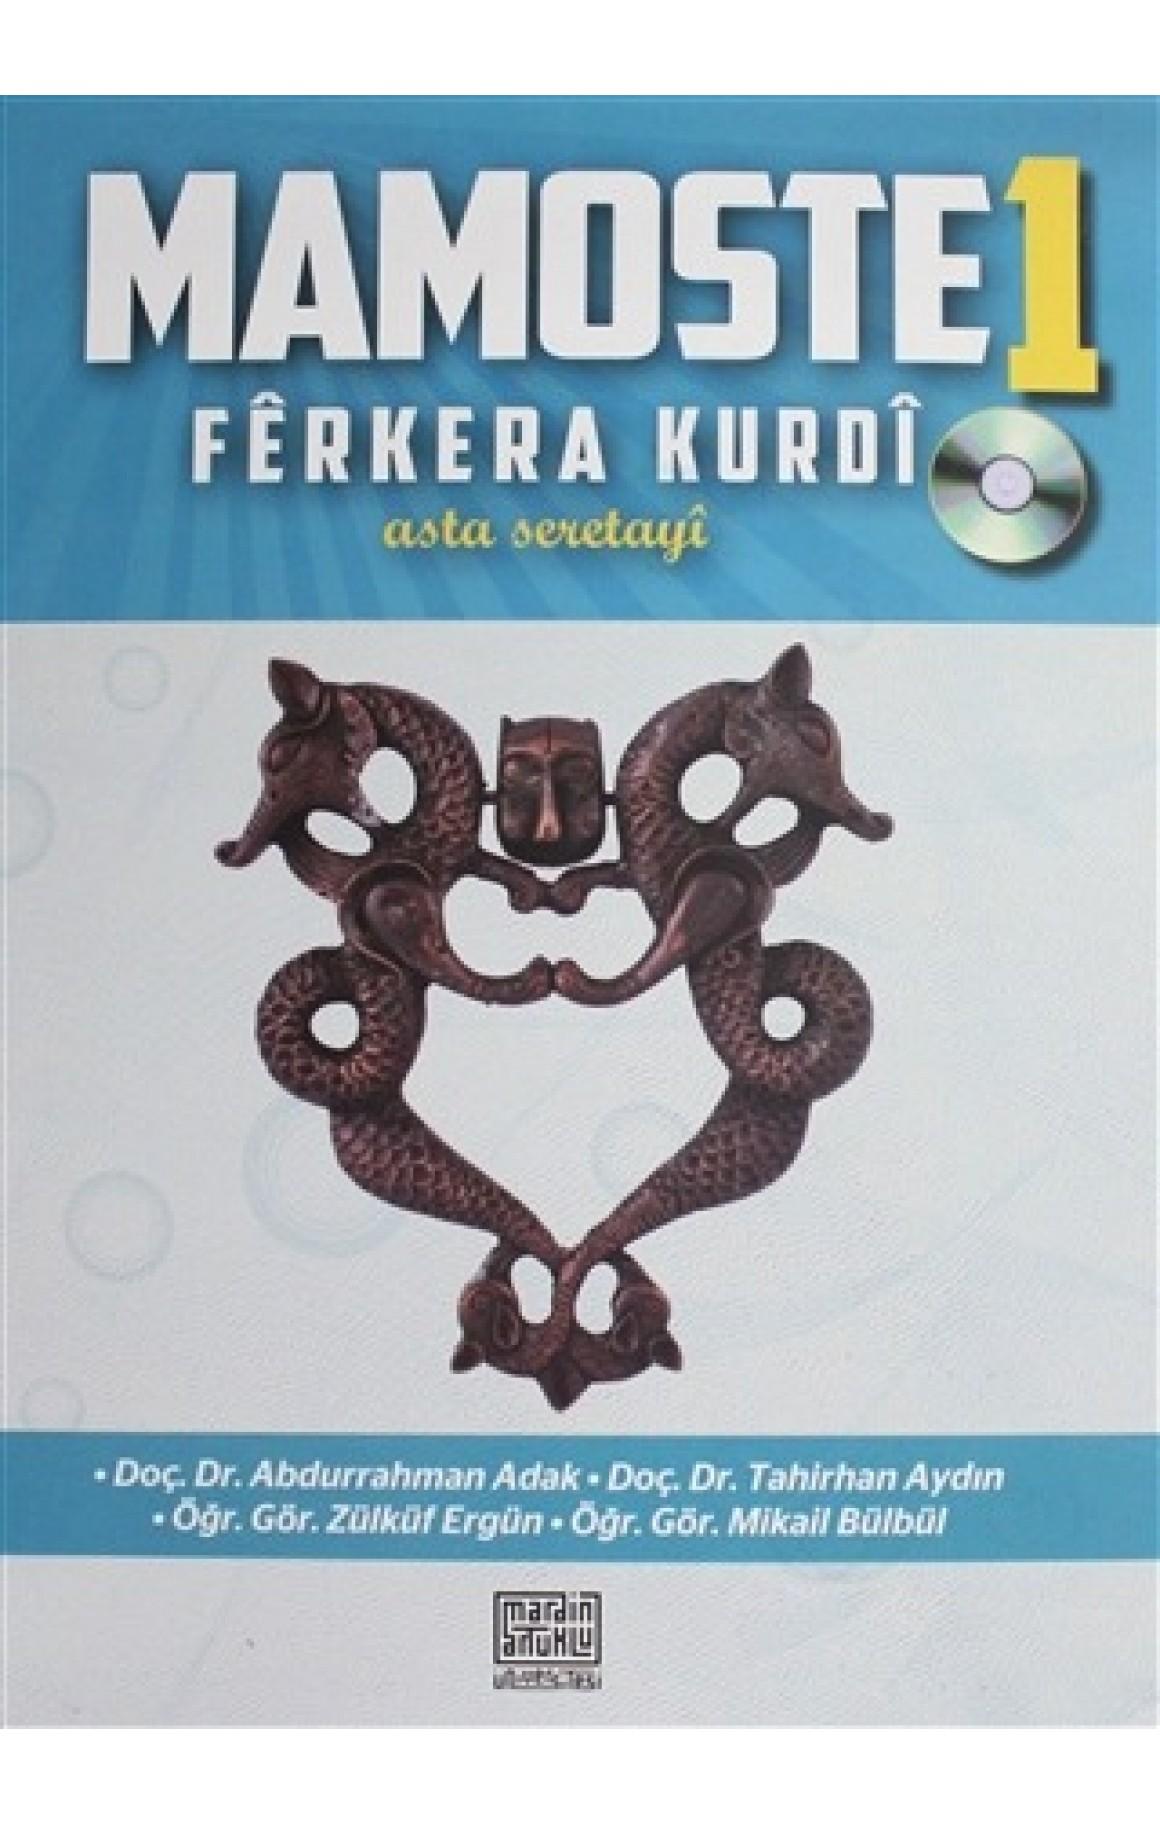 Mamoste 1 - Fêrkera Kurdî